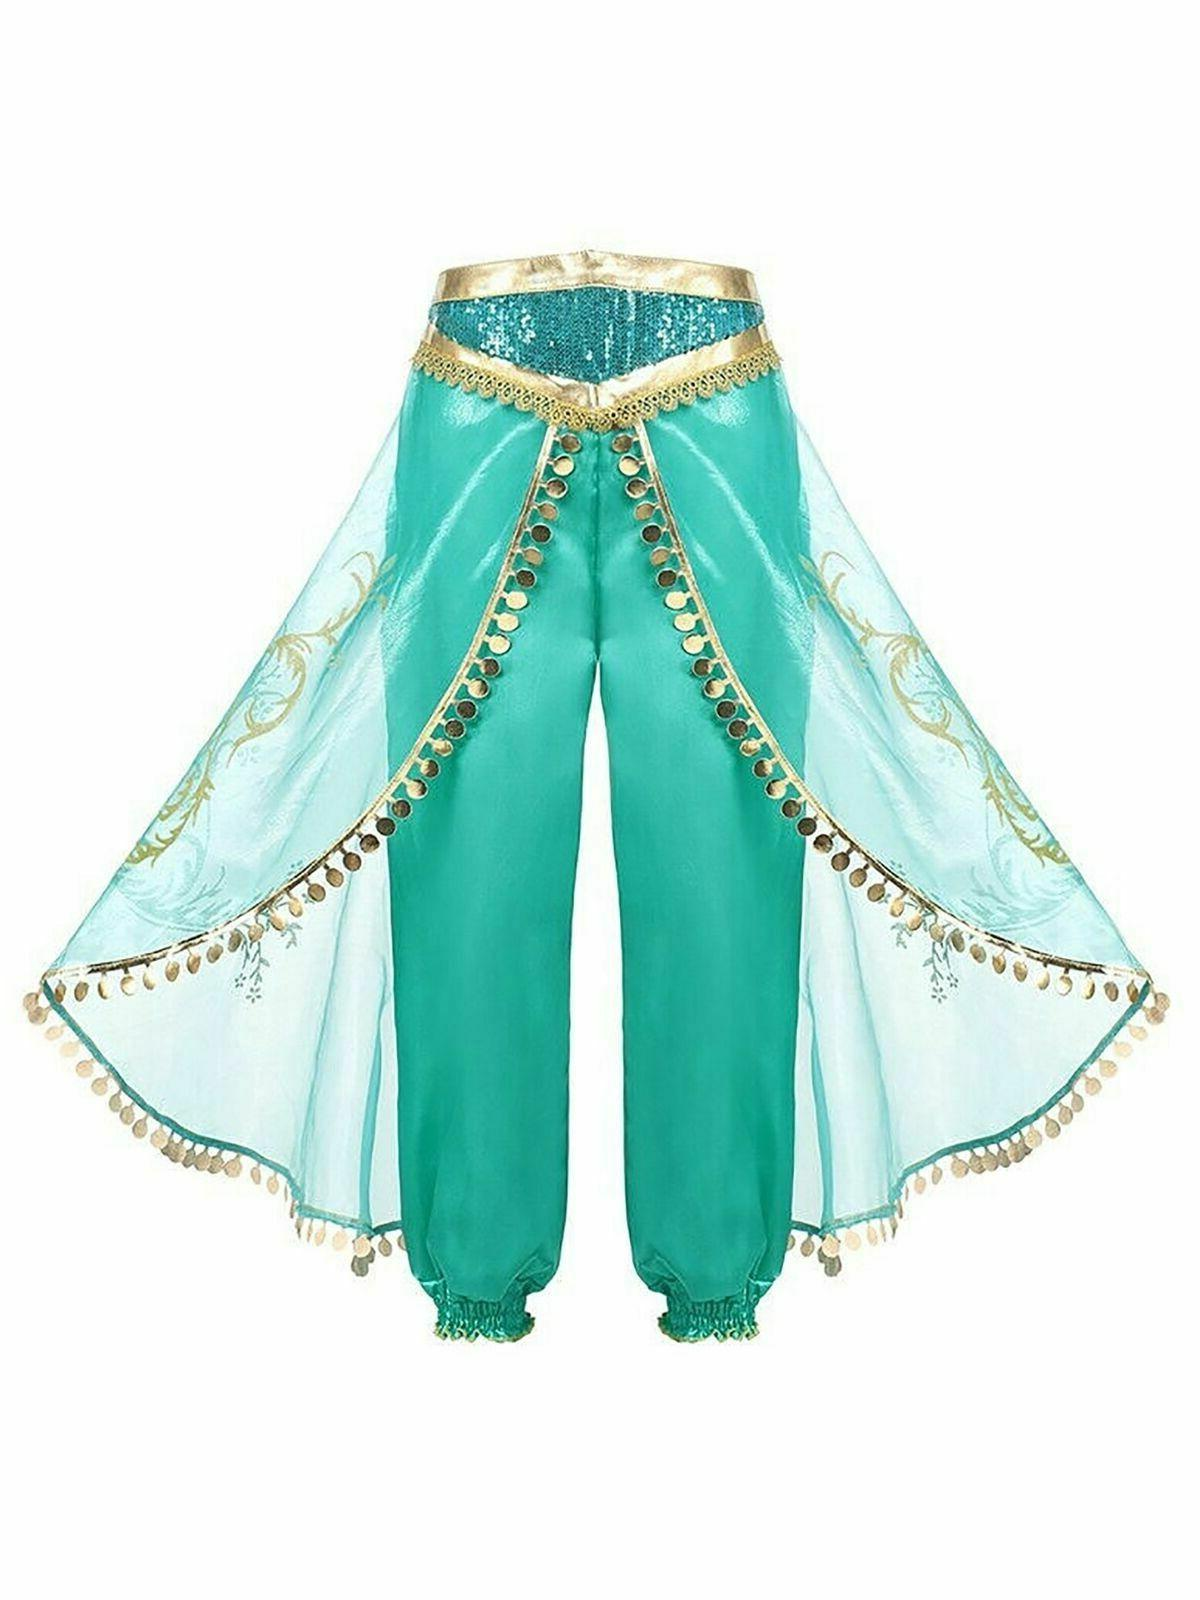 Aladdin Jasmine Baby Fancy Dress Party Costume Sets